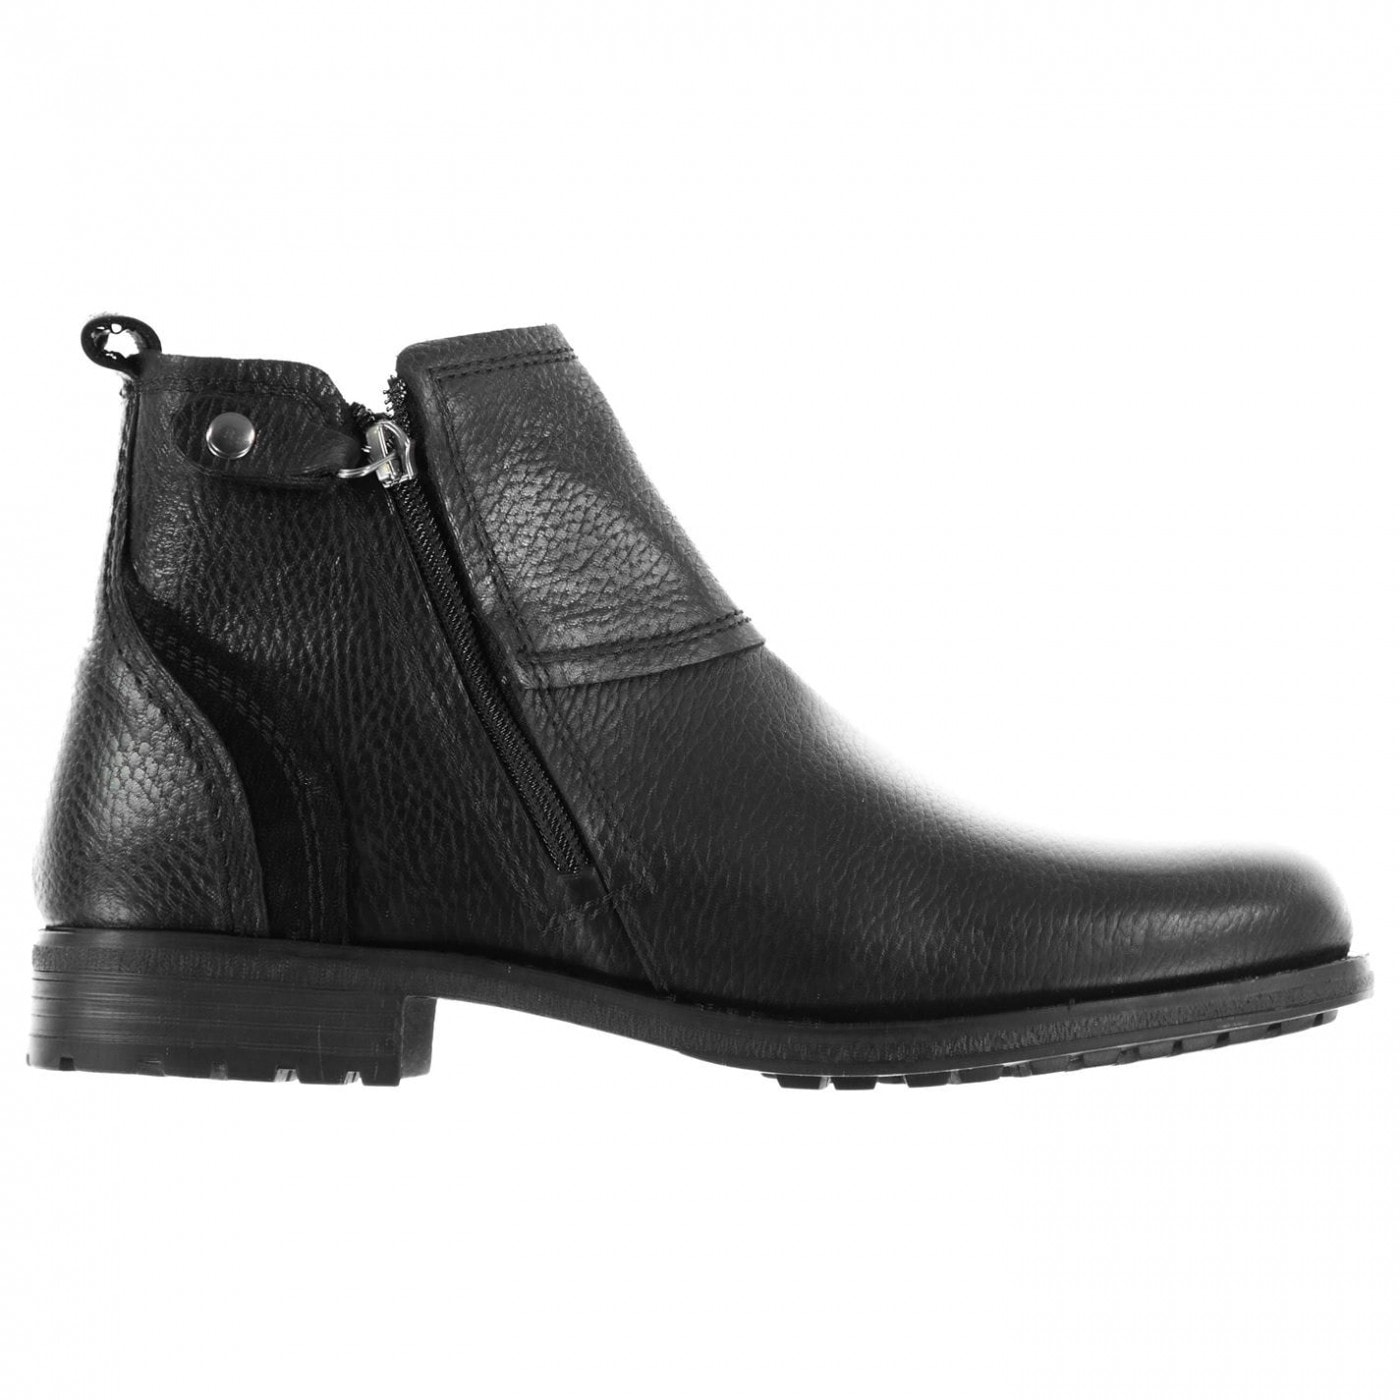 Men's boots Firetrap Jinx Smart